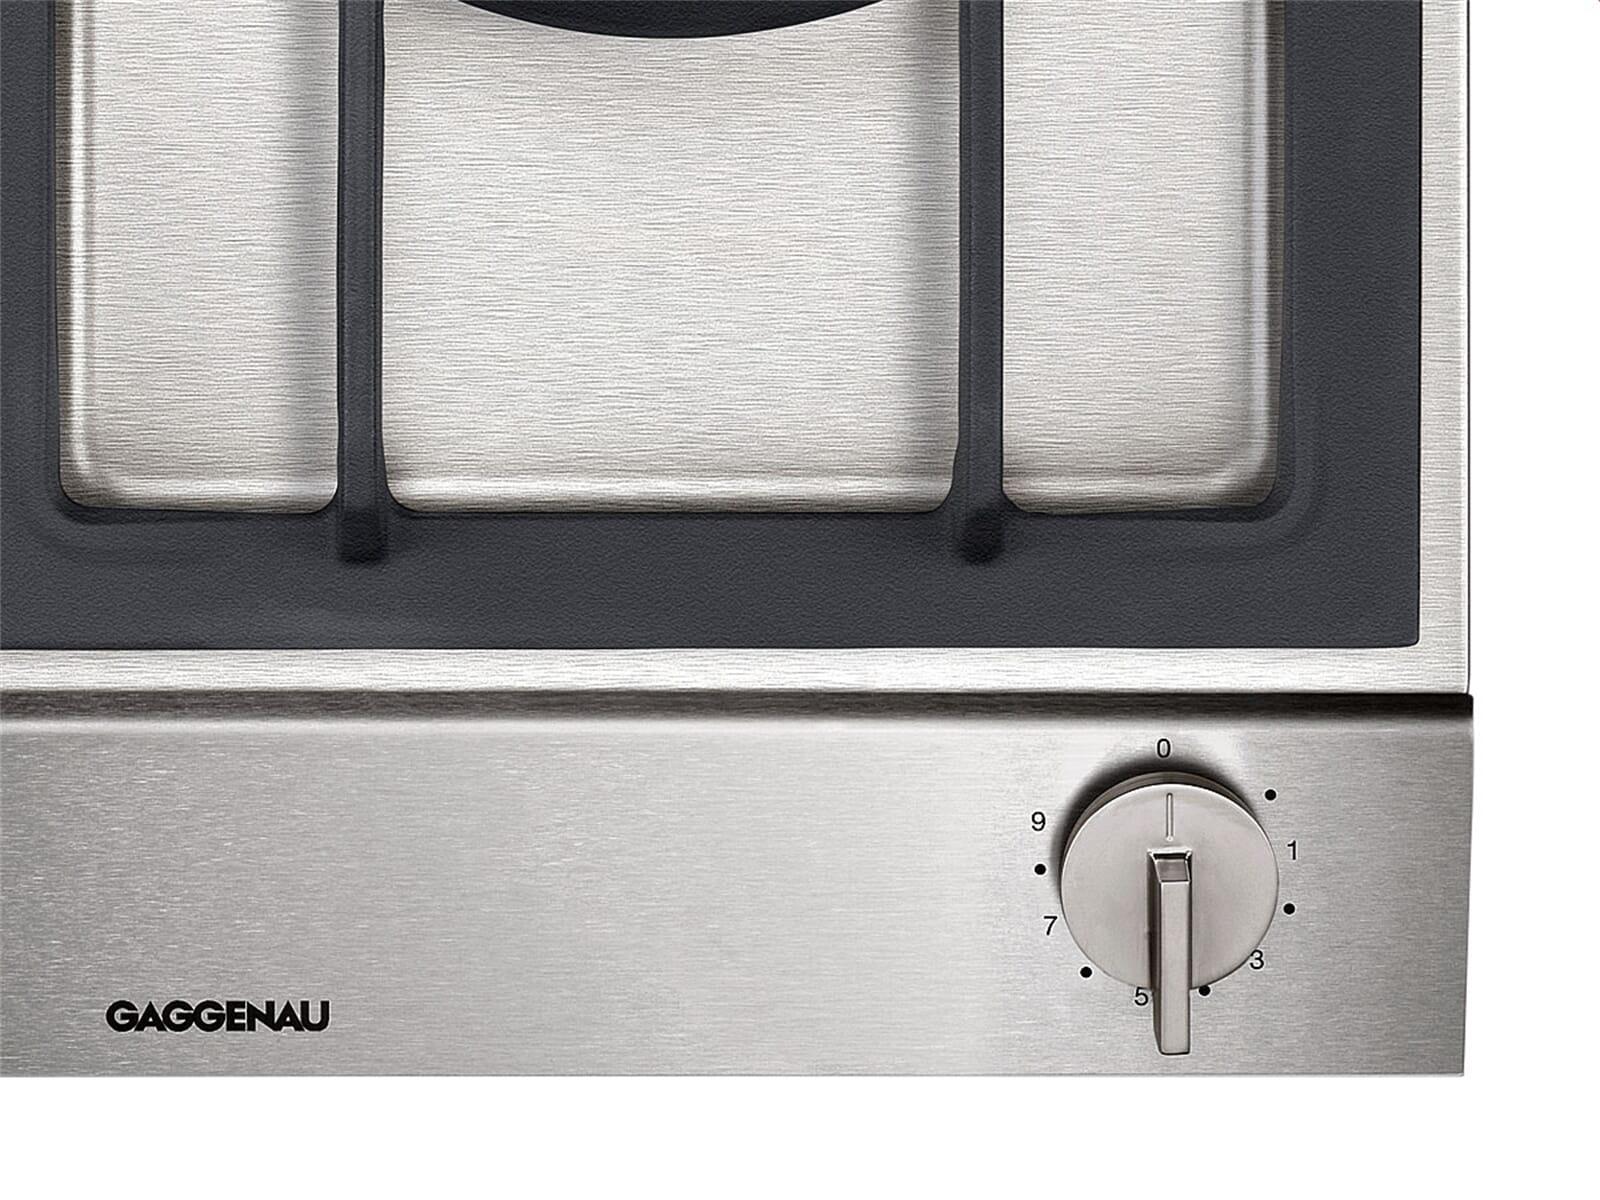 gaggenau vg 231 114 serie 200 domino edelstahl gaskochfeld. Black Bedroom Furniture Sets. Home Design Ideas